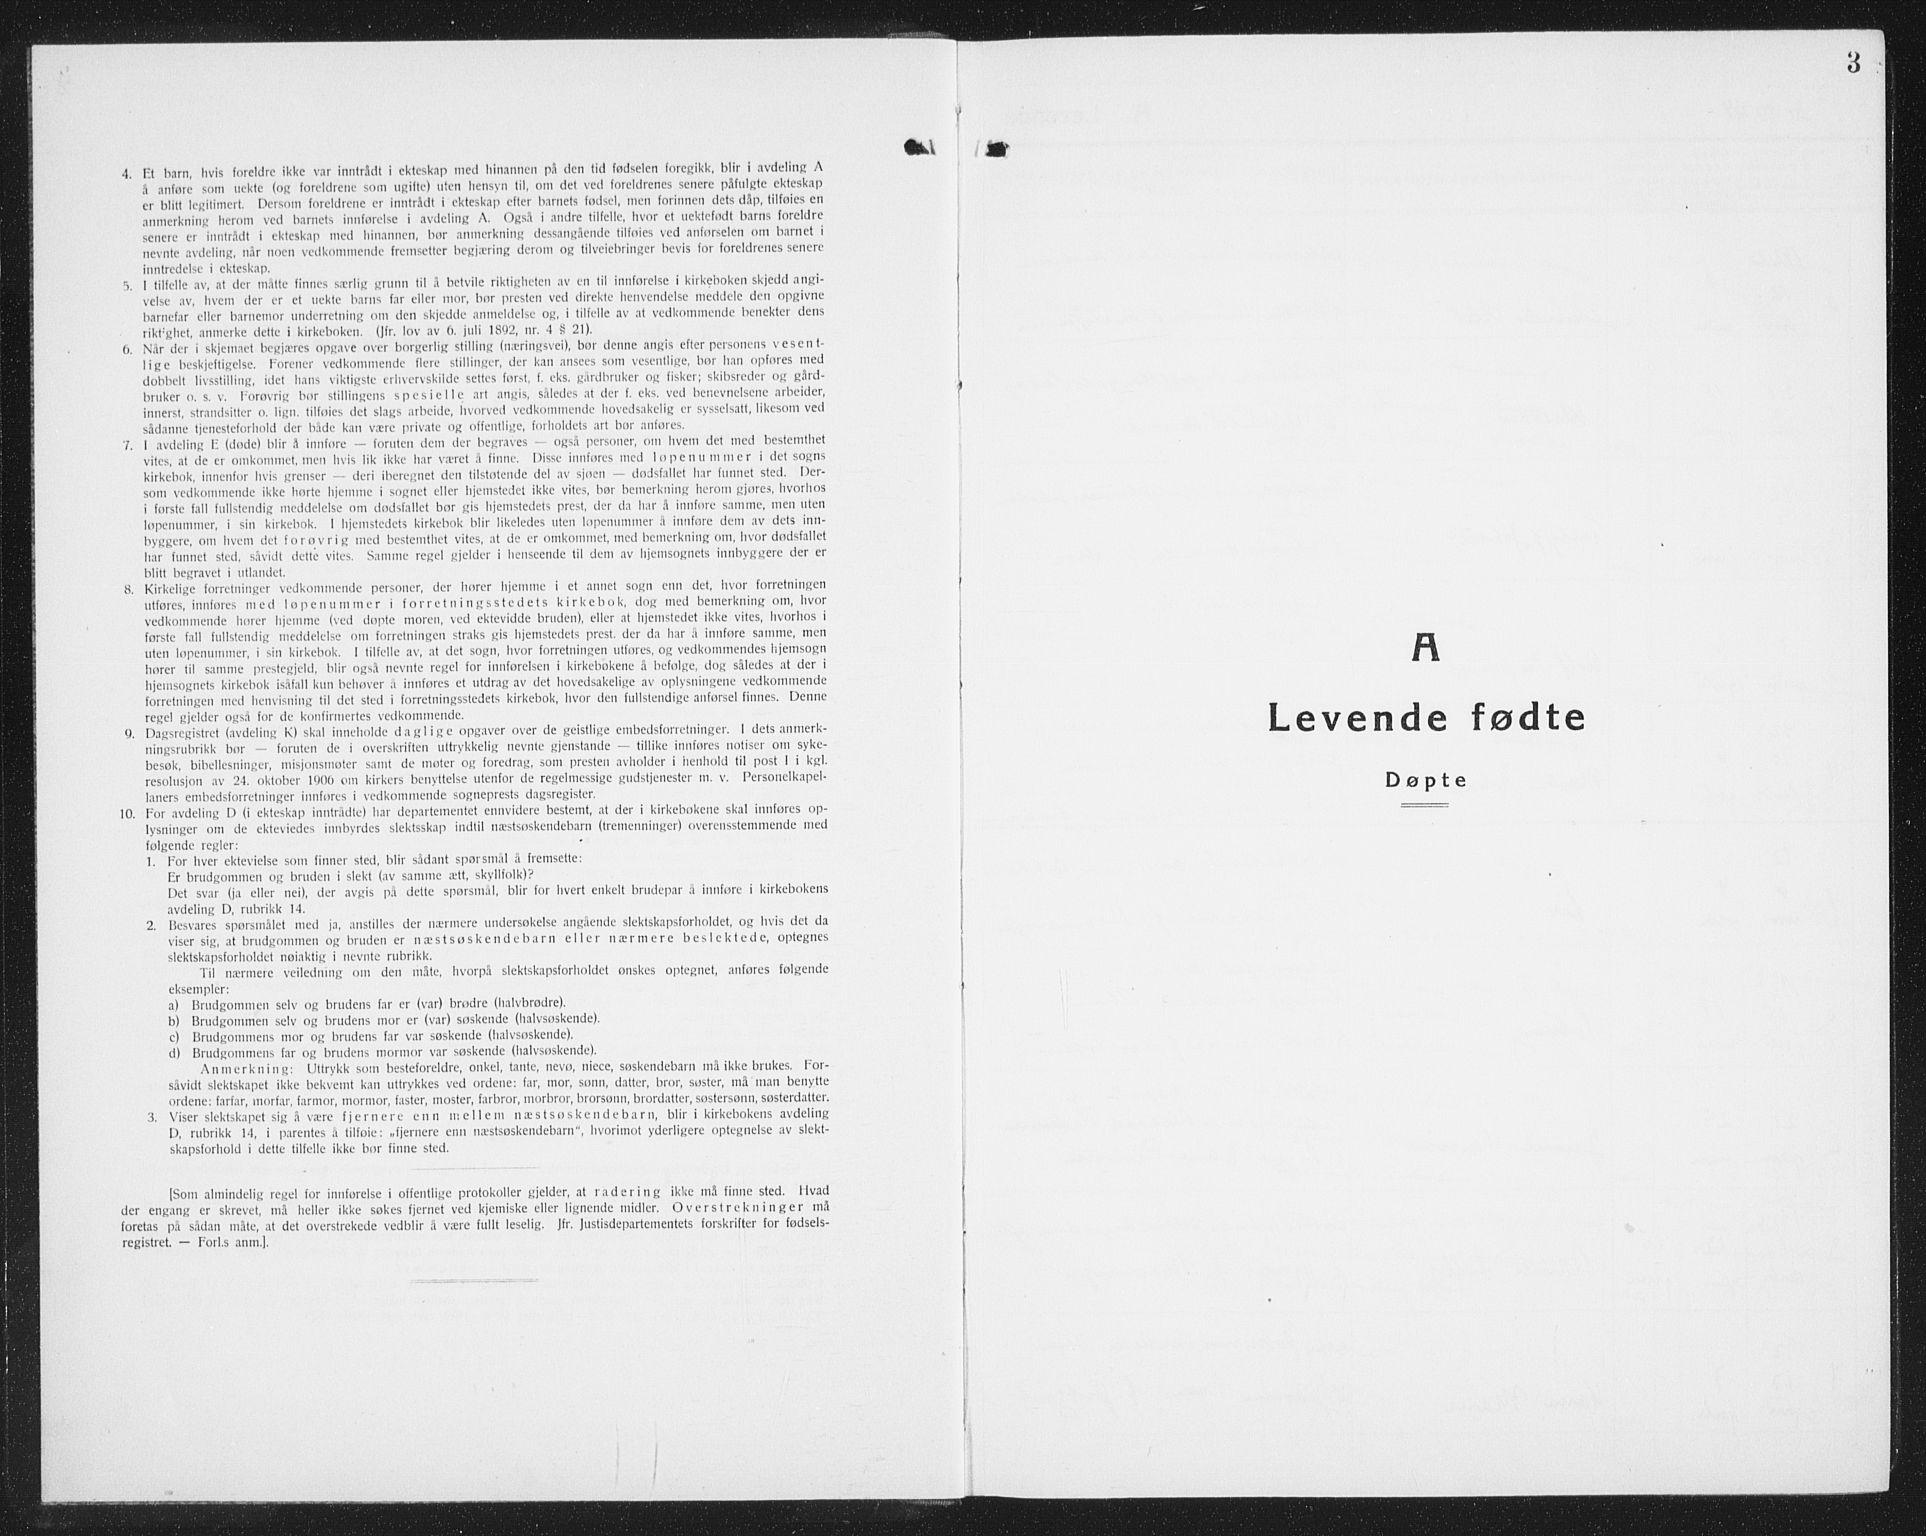 SAT, Ministerialprotokoller, klokkerbøker og fødselsregistre - Nordland, 877/L1117: Klokkerbok nr. 877C01, 1923-1942, s. 3